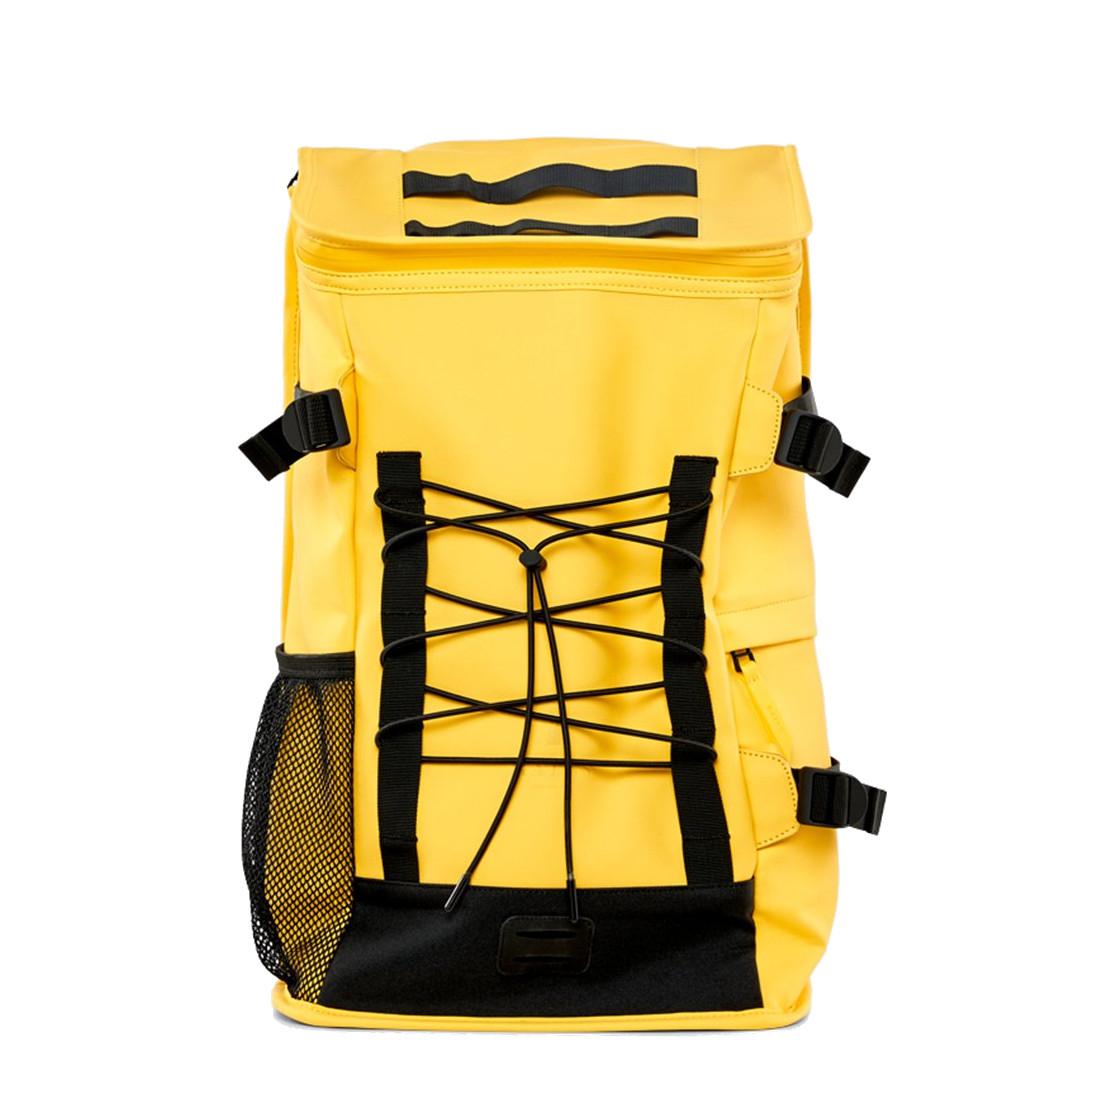 Afbeelding van Rains Original Mountaineer Bag Backpack Yellow Casual Rugtassen